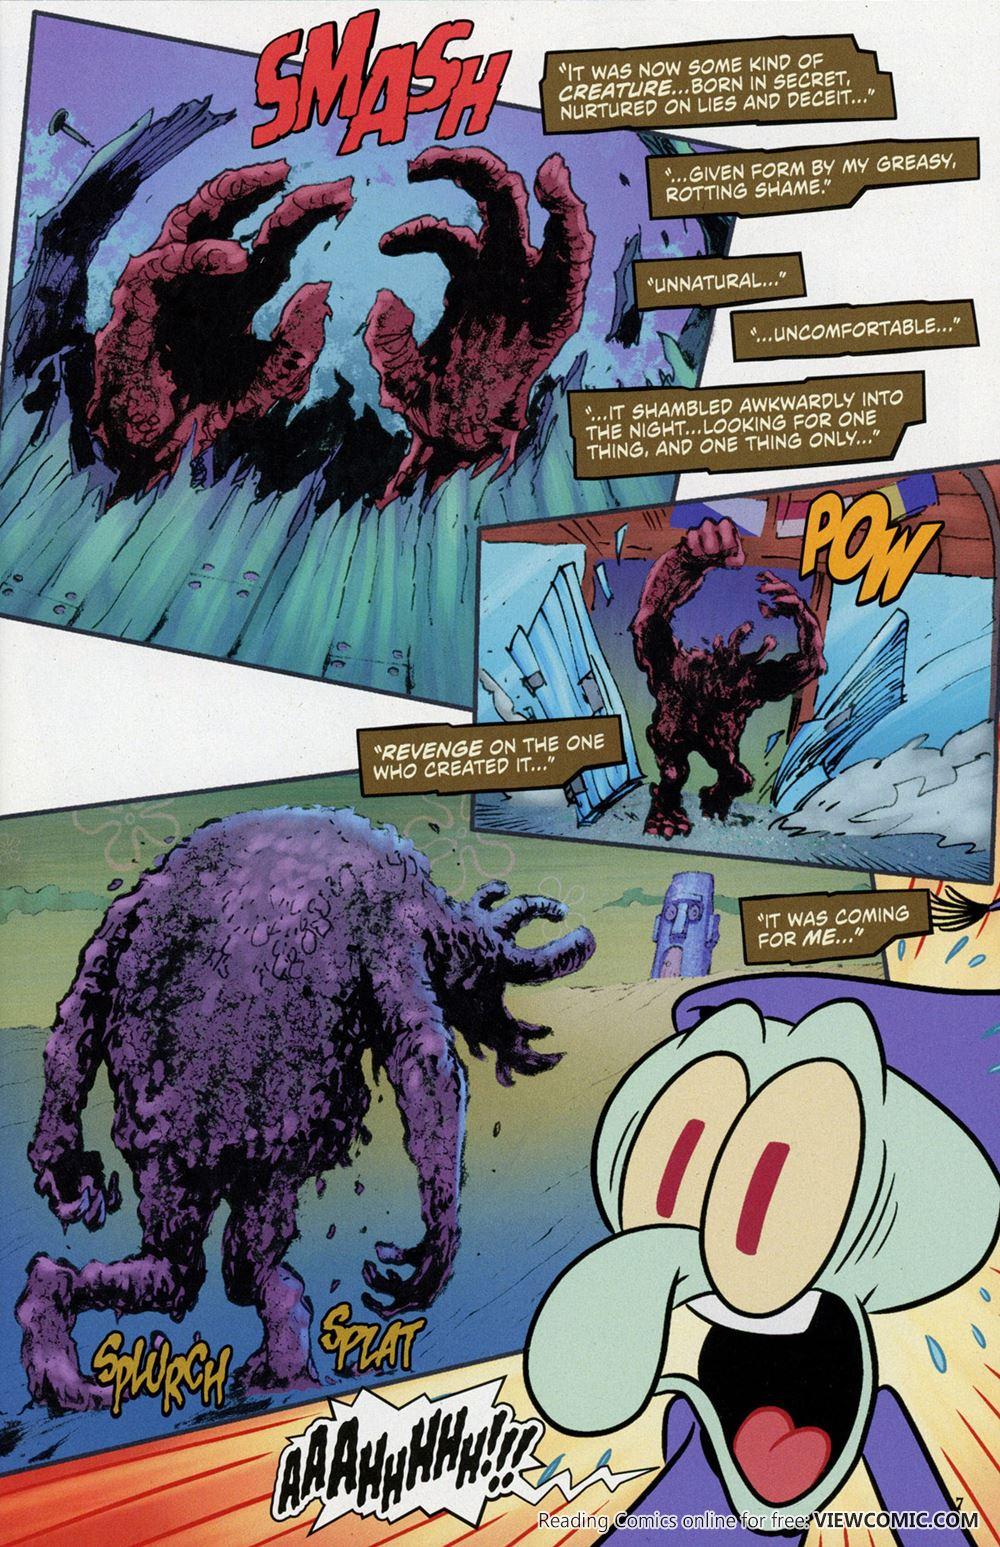 read comic spongebob comics spongebob comics 049 2015 u2026 view